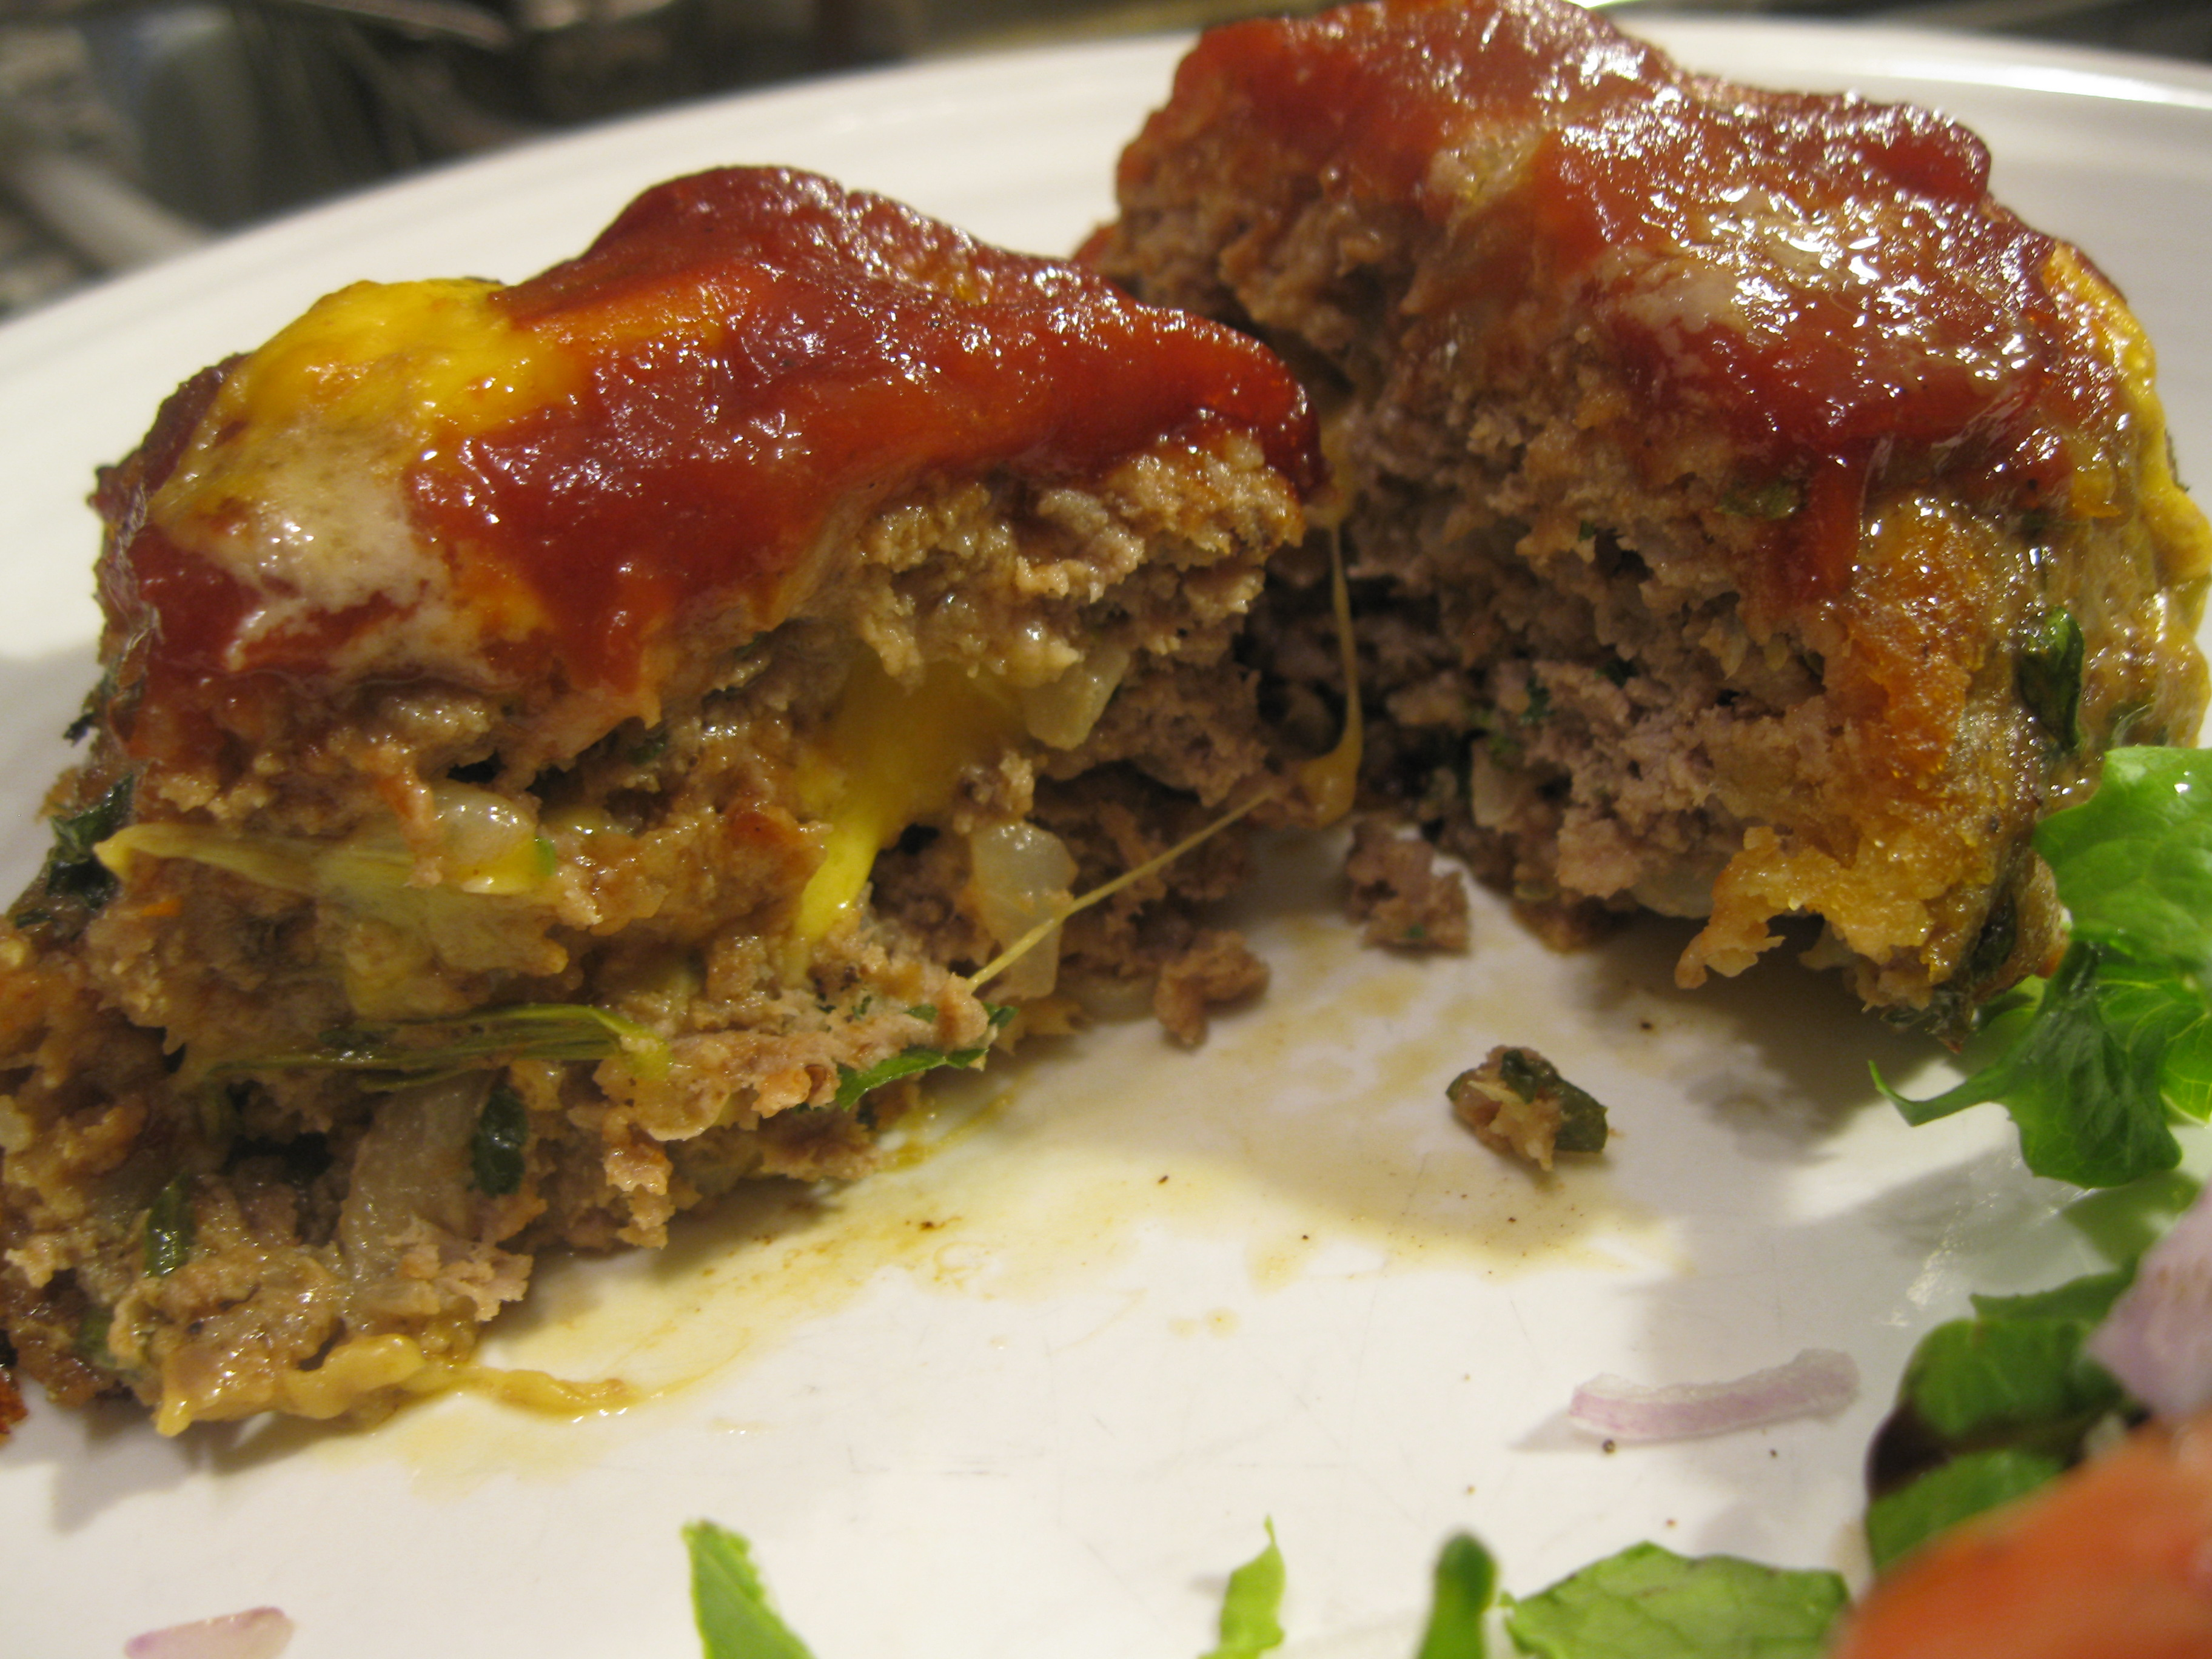 Recipe 21.4: Cheesy Mini Meatloafs with Salad